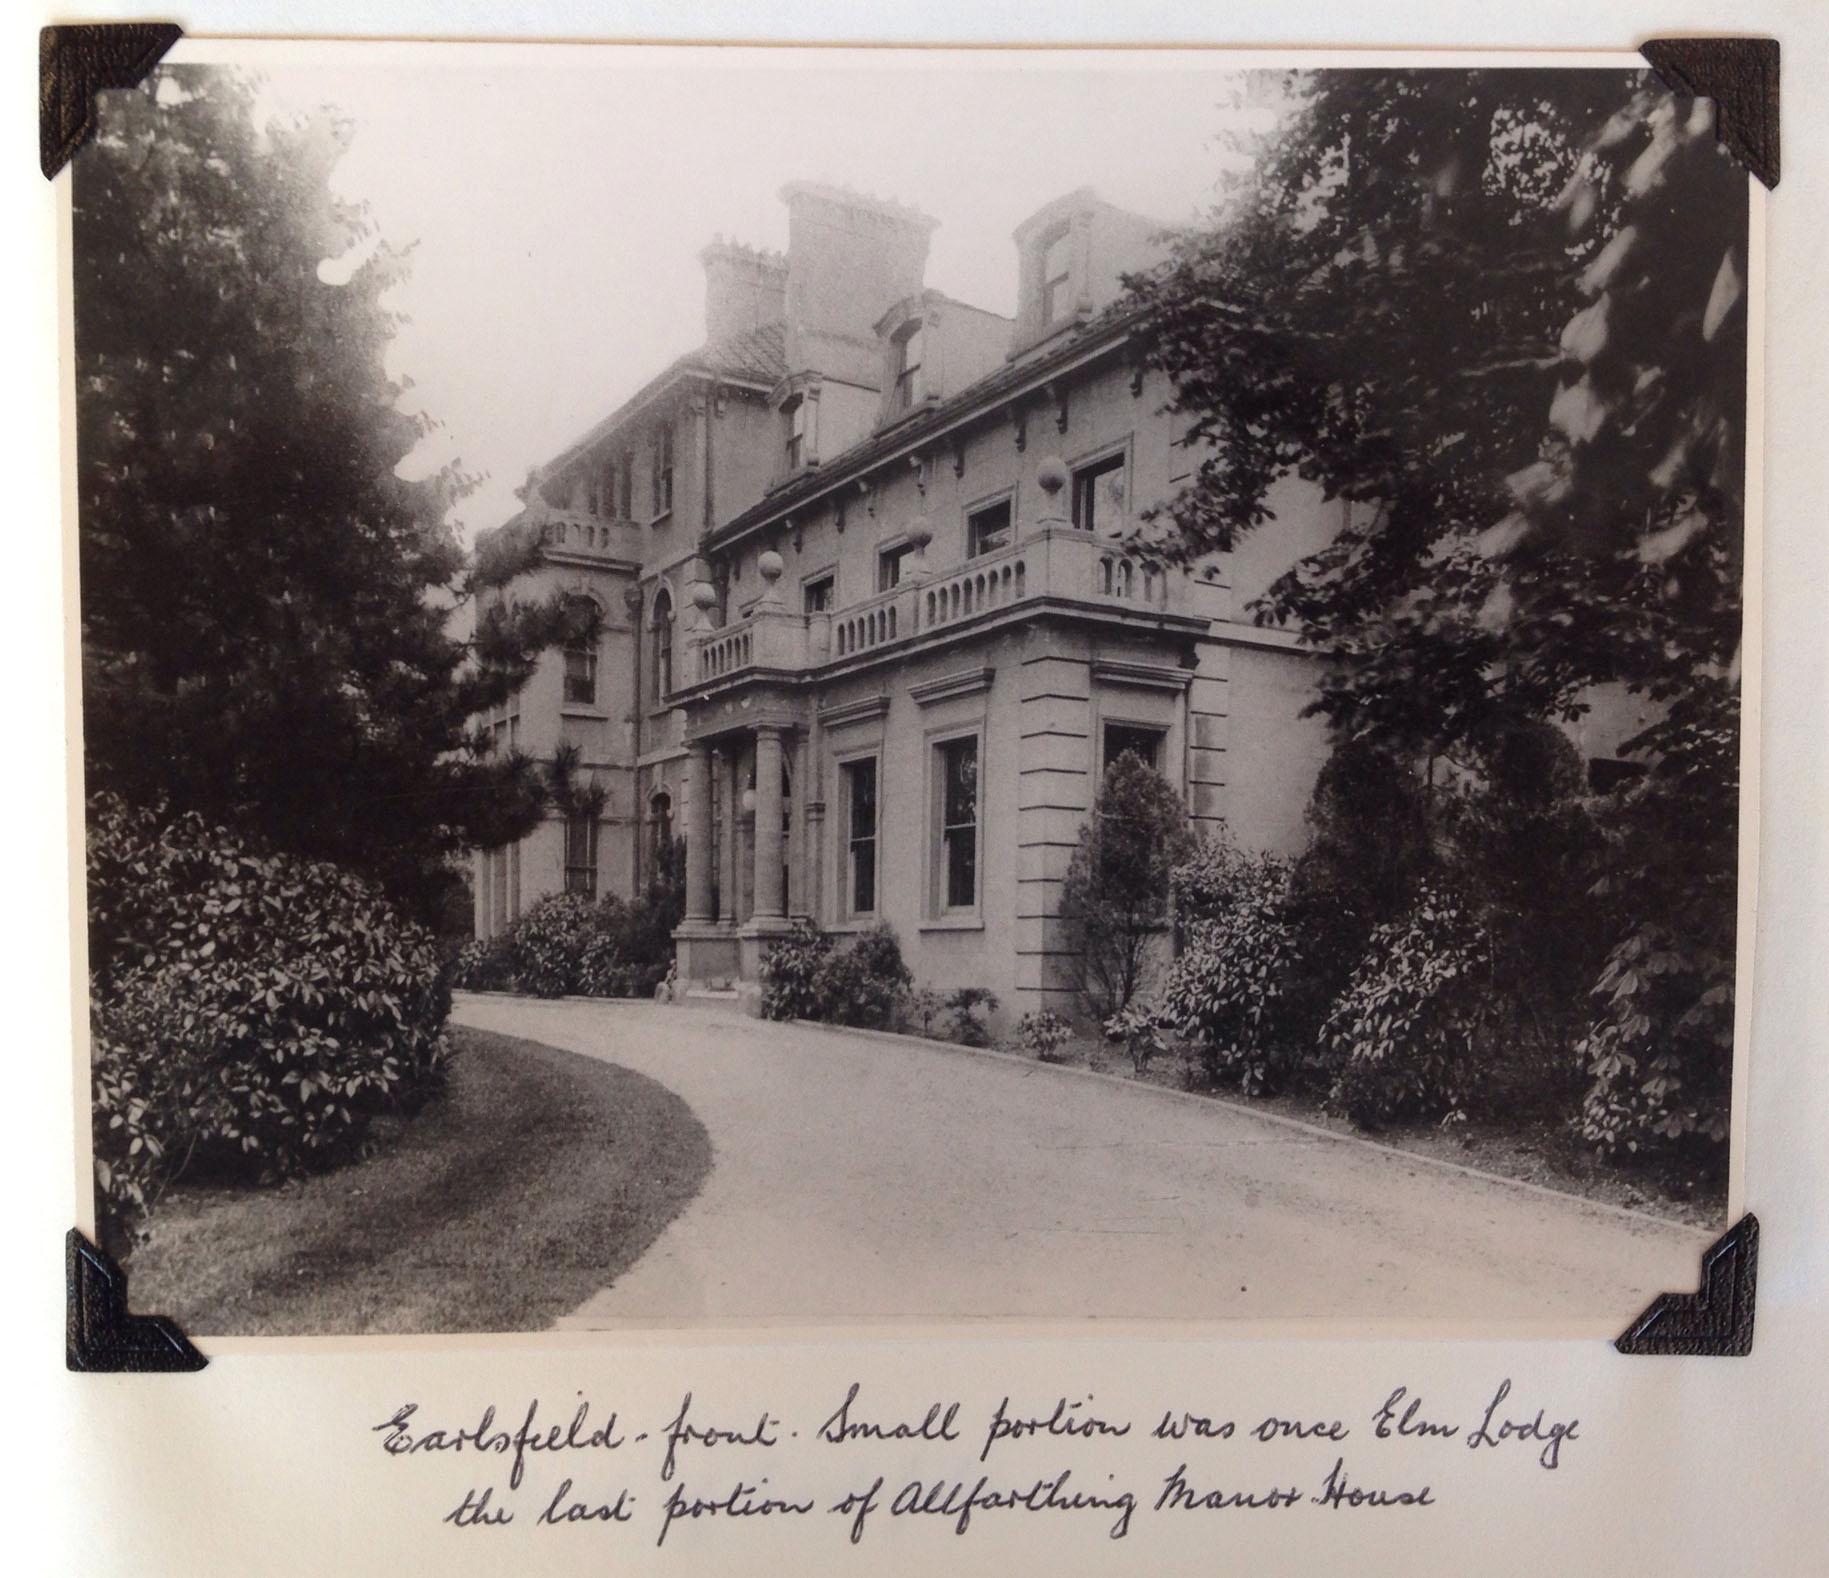 EarlsfieldHouse Wandsworth1